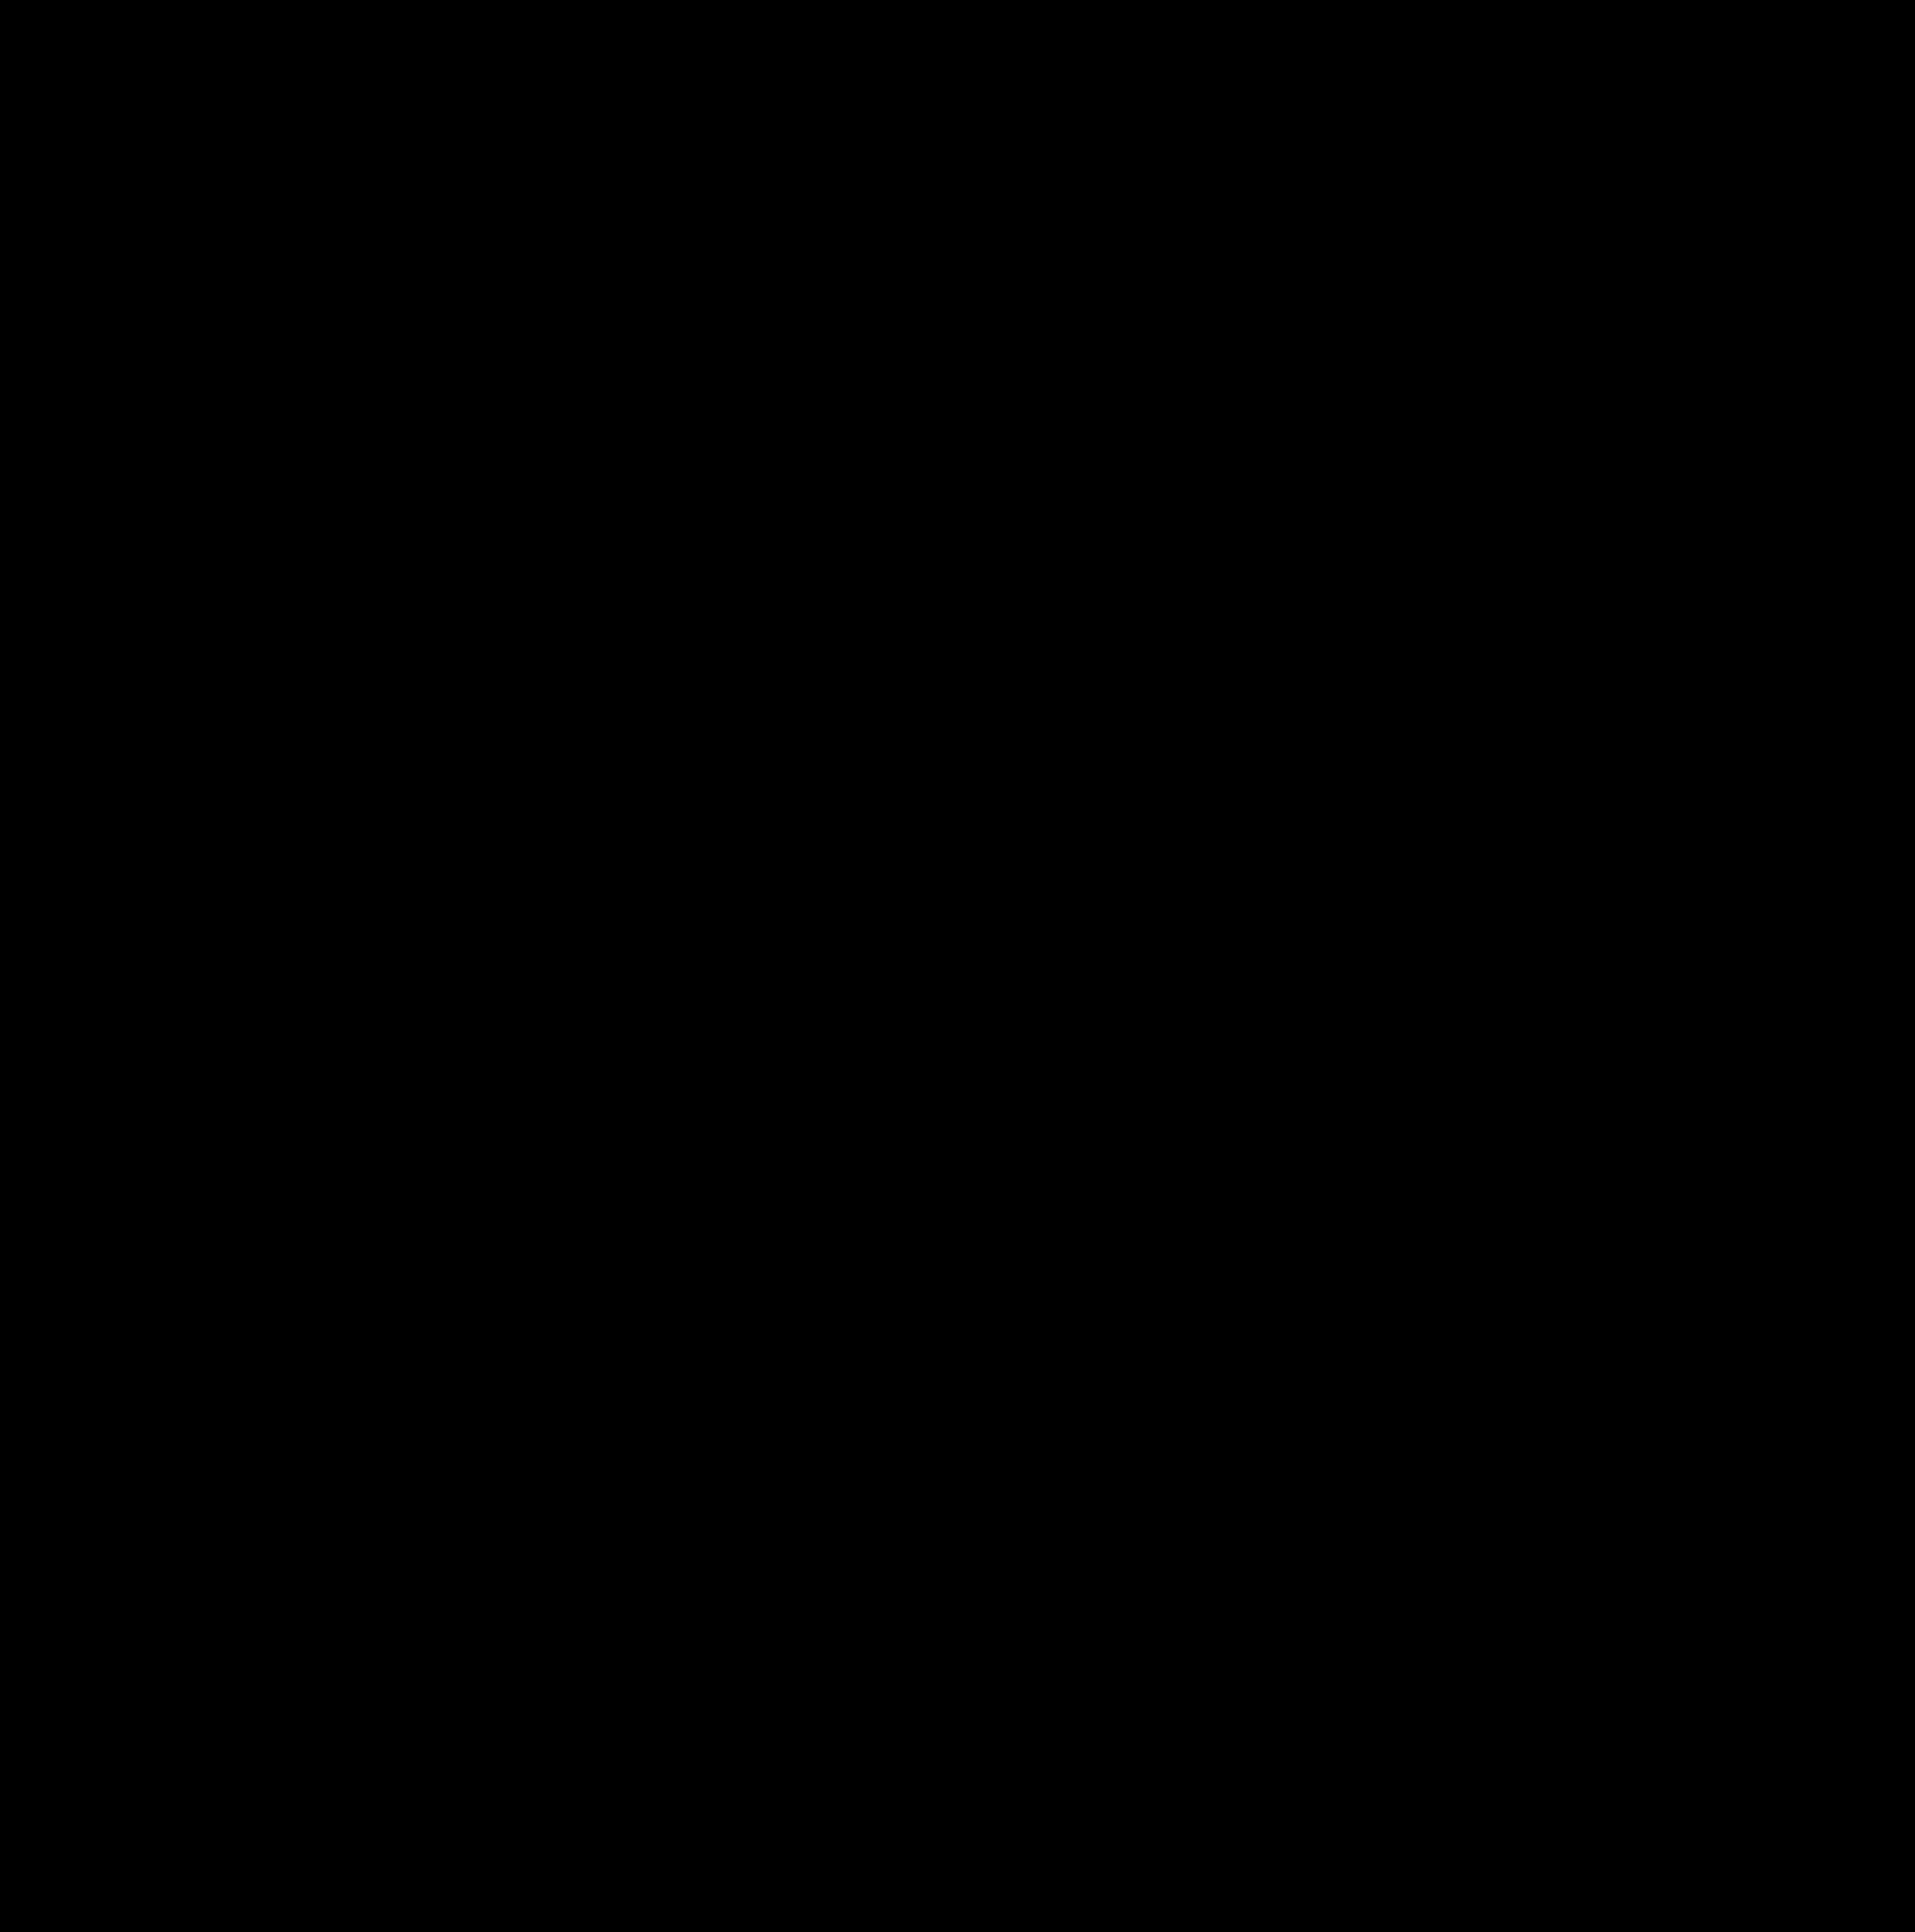 png transparent Clipart